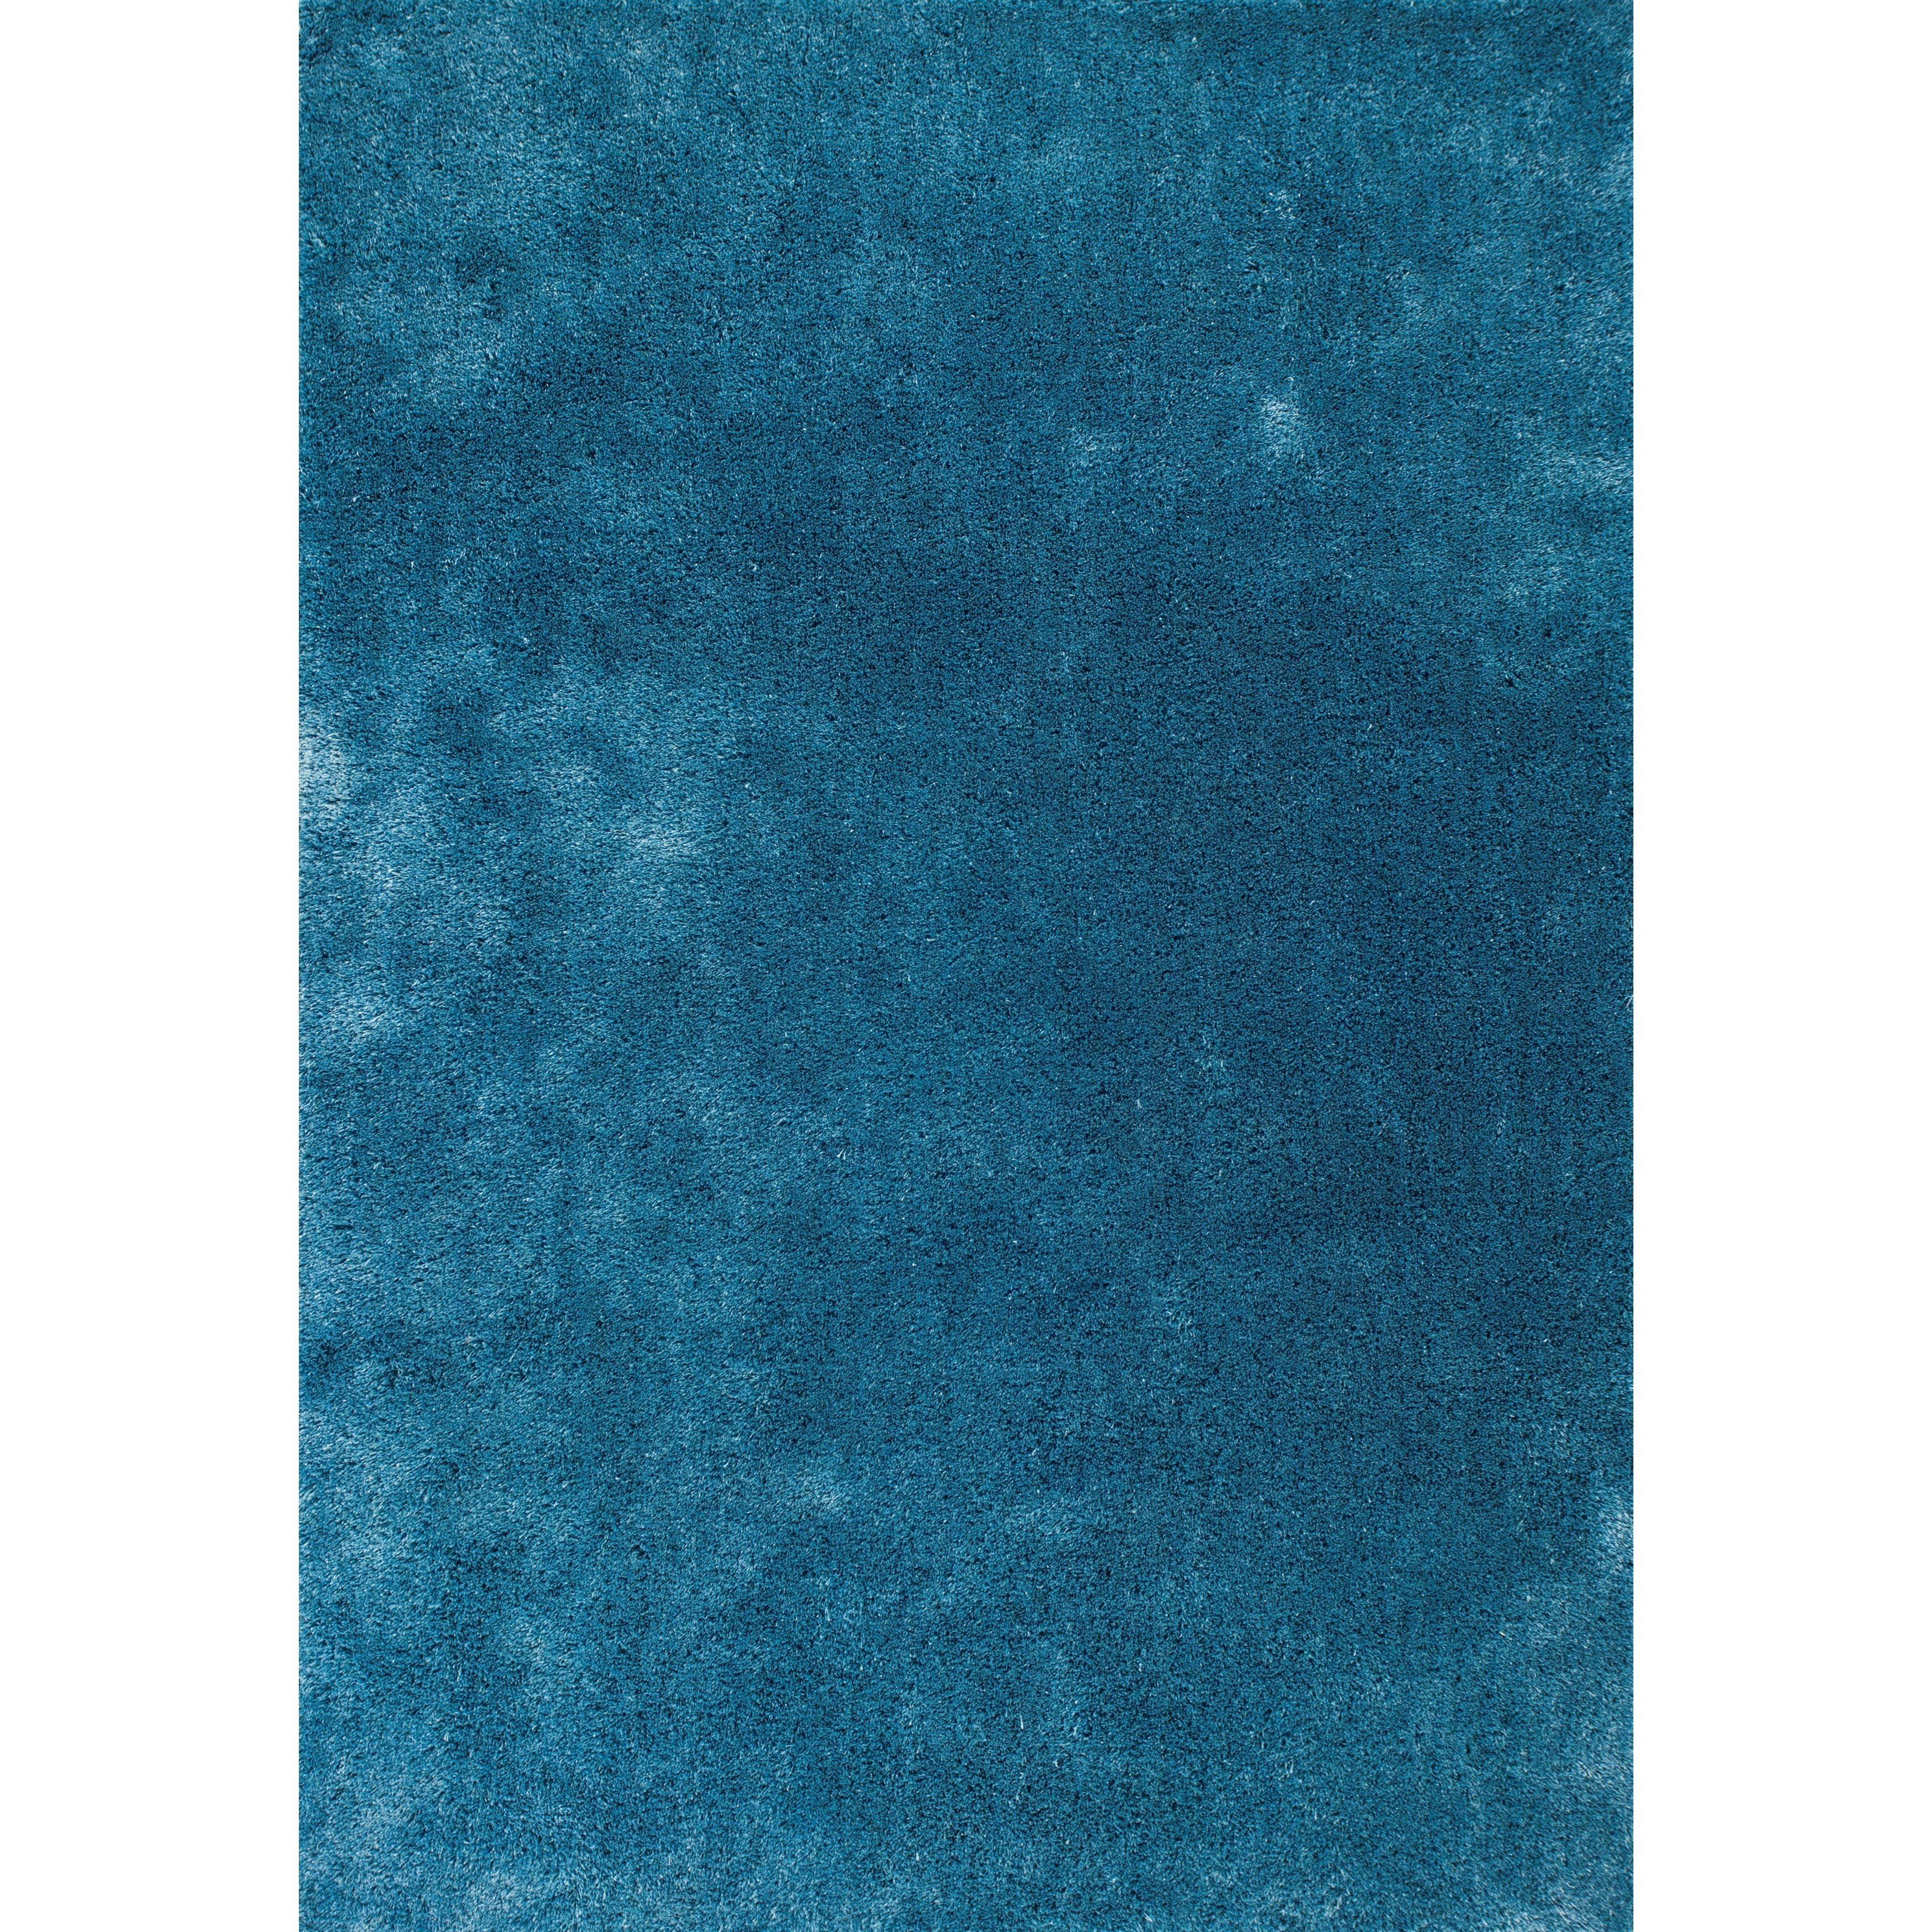 5' X 7' Laguna Blue Area Rug